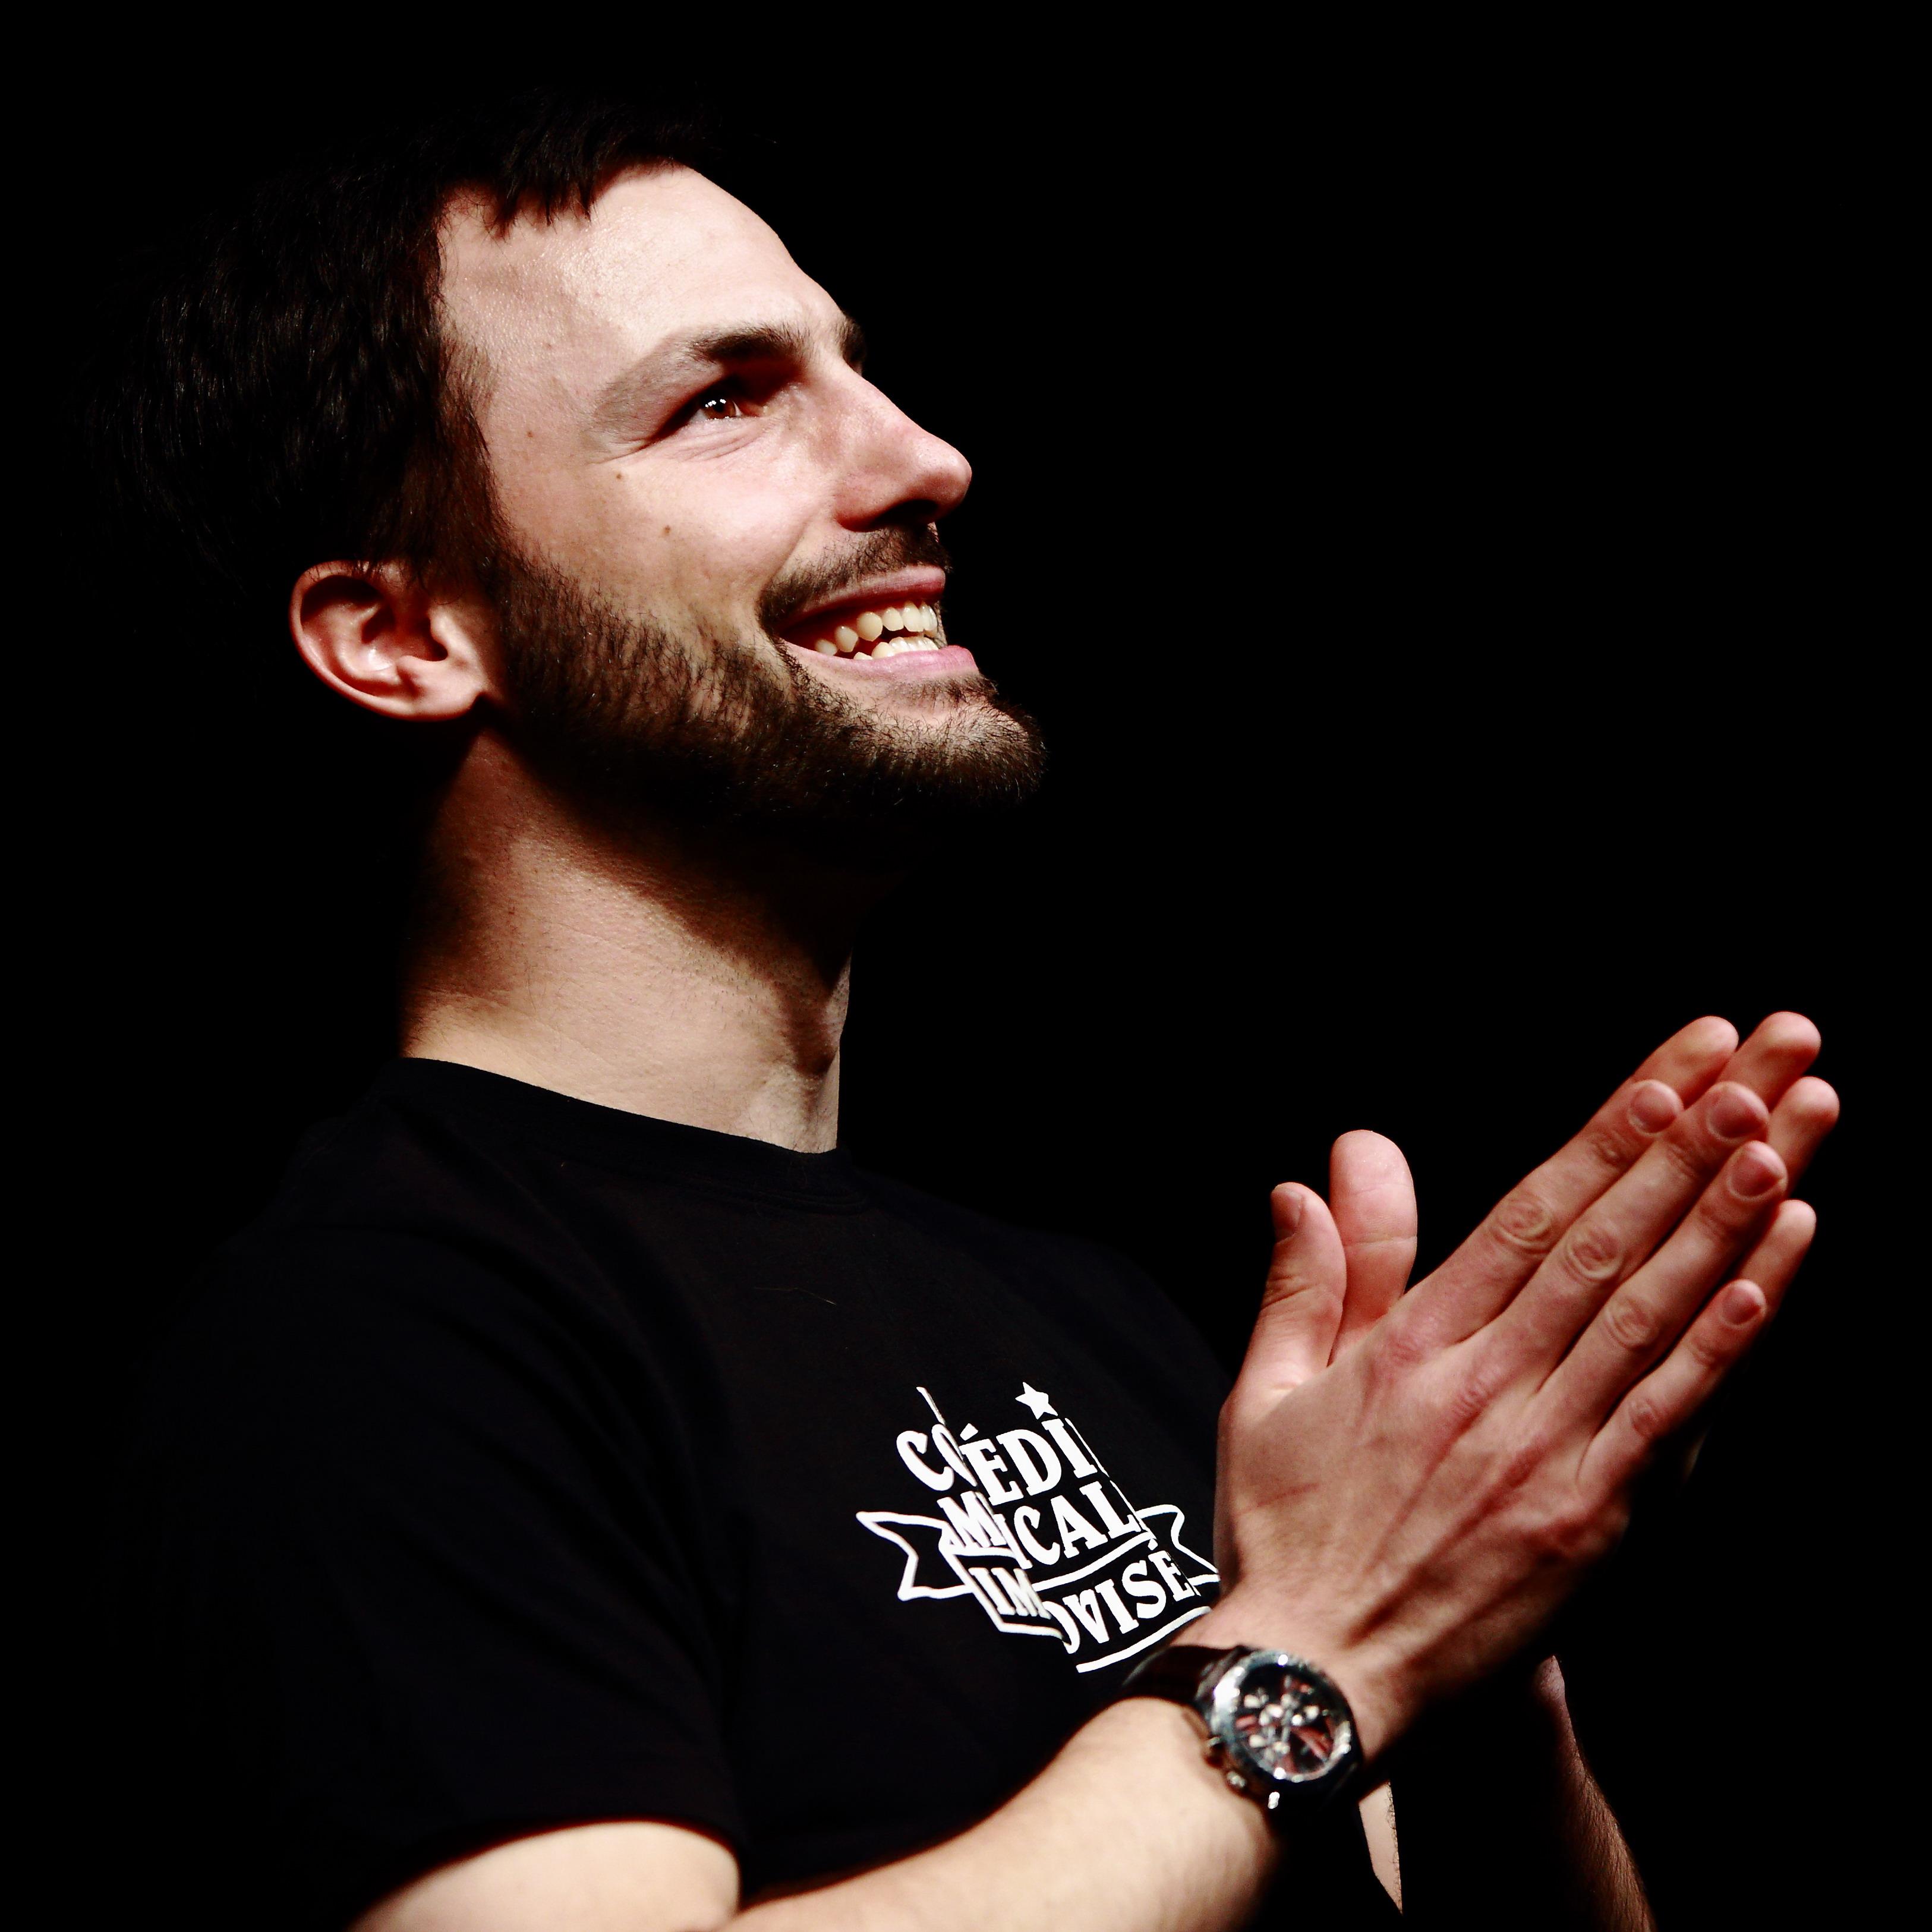 Improvisation Théâtre Improvisation Lyon Théâtre Improvisation Bordeaux Michel Pichu